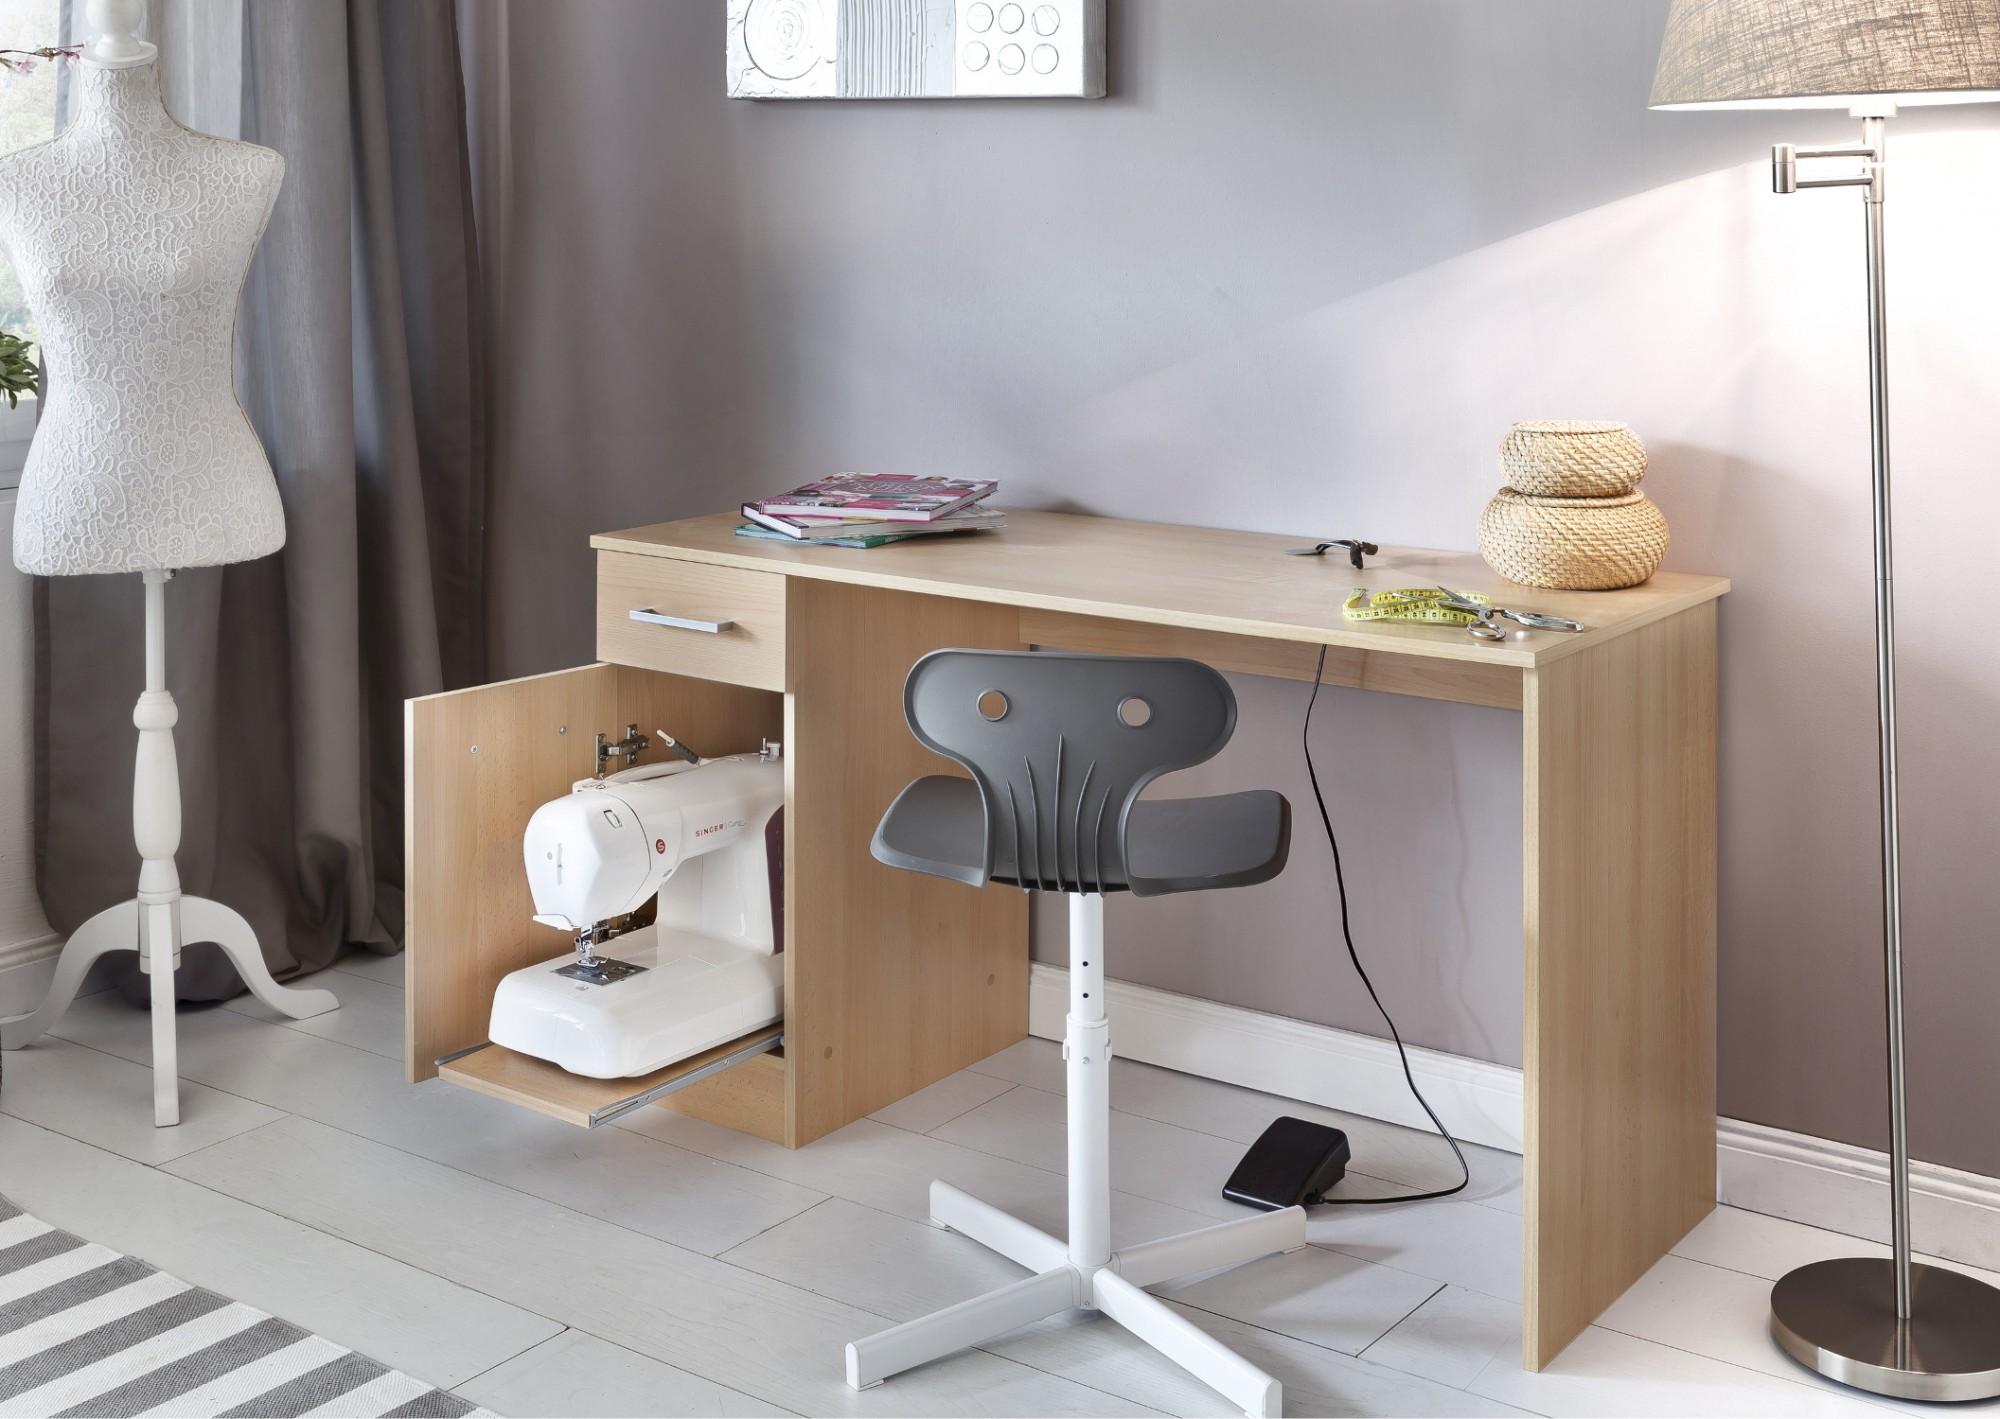 120 cm breit buche good amazing kommode cm hoch unique cm breit schiebetren fabulous standregal. Black Bedroom Furniture Sets. Home Design Ideas